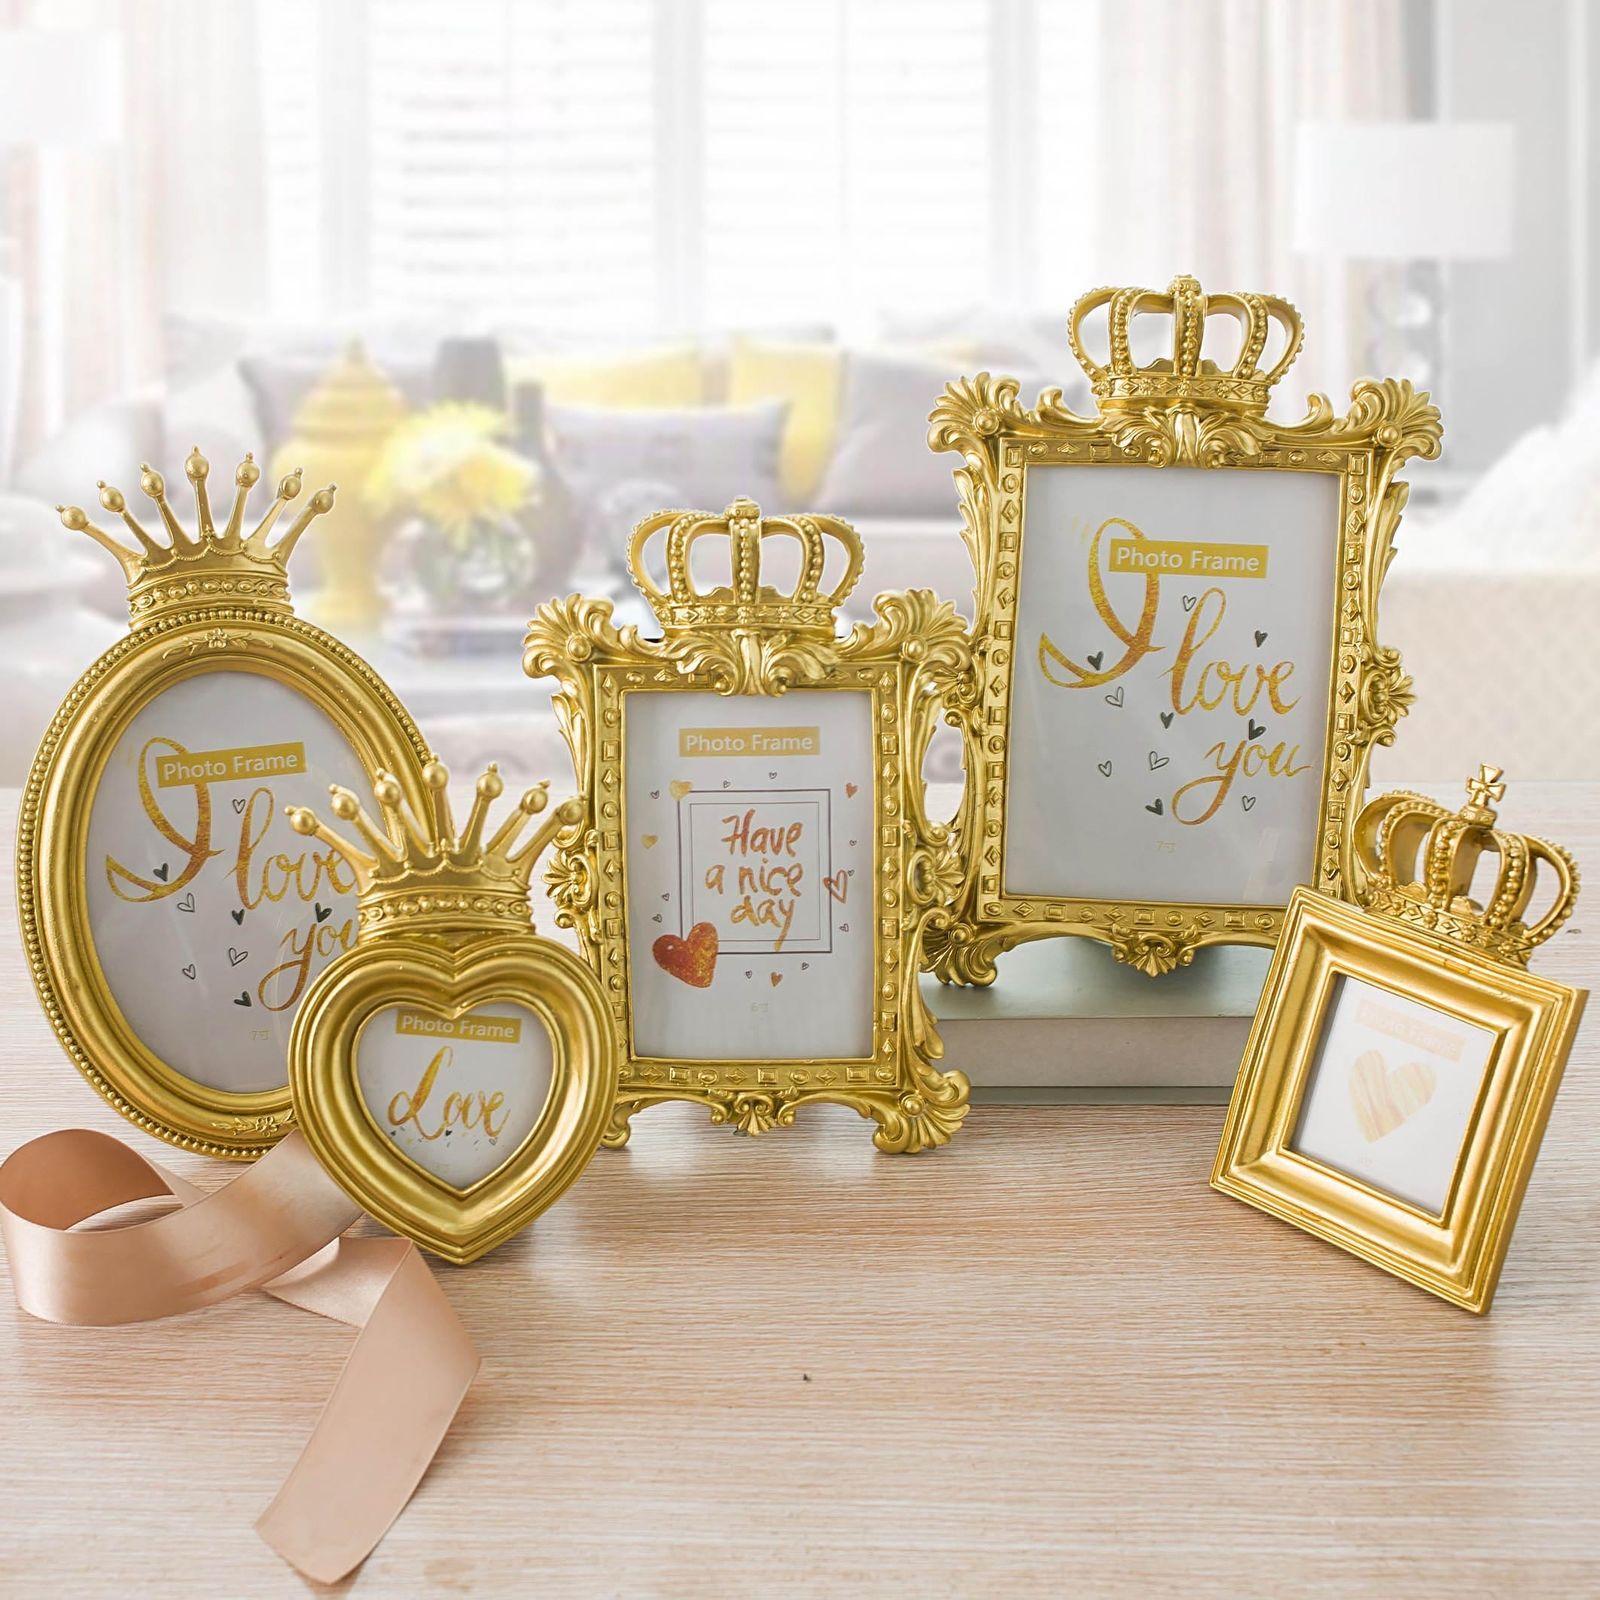 Luxury Gold Crown Picture Frame Photo Frame Set Home Decor Desktop ...